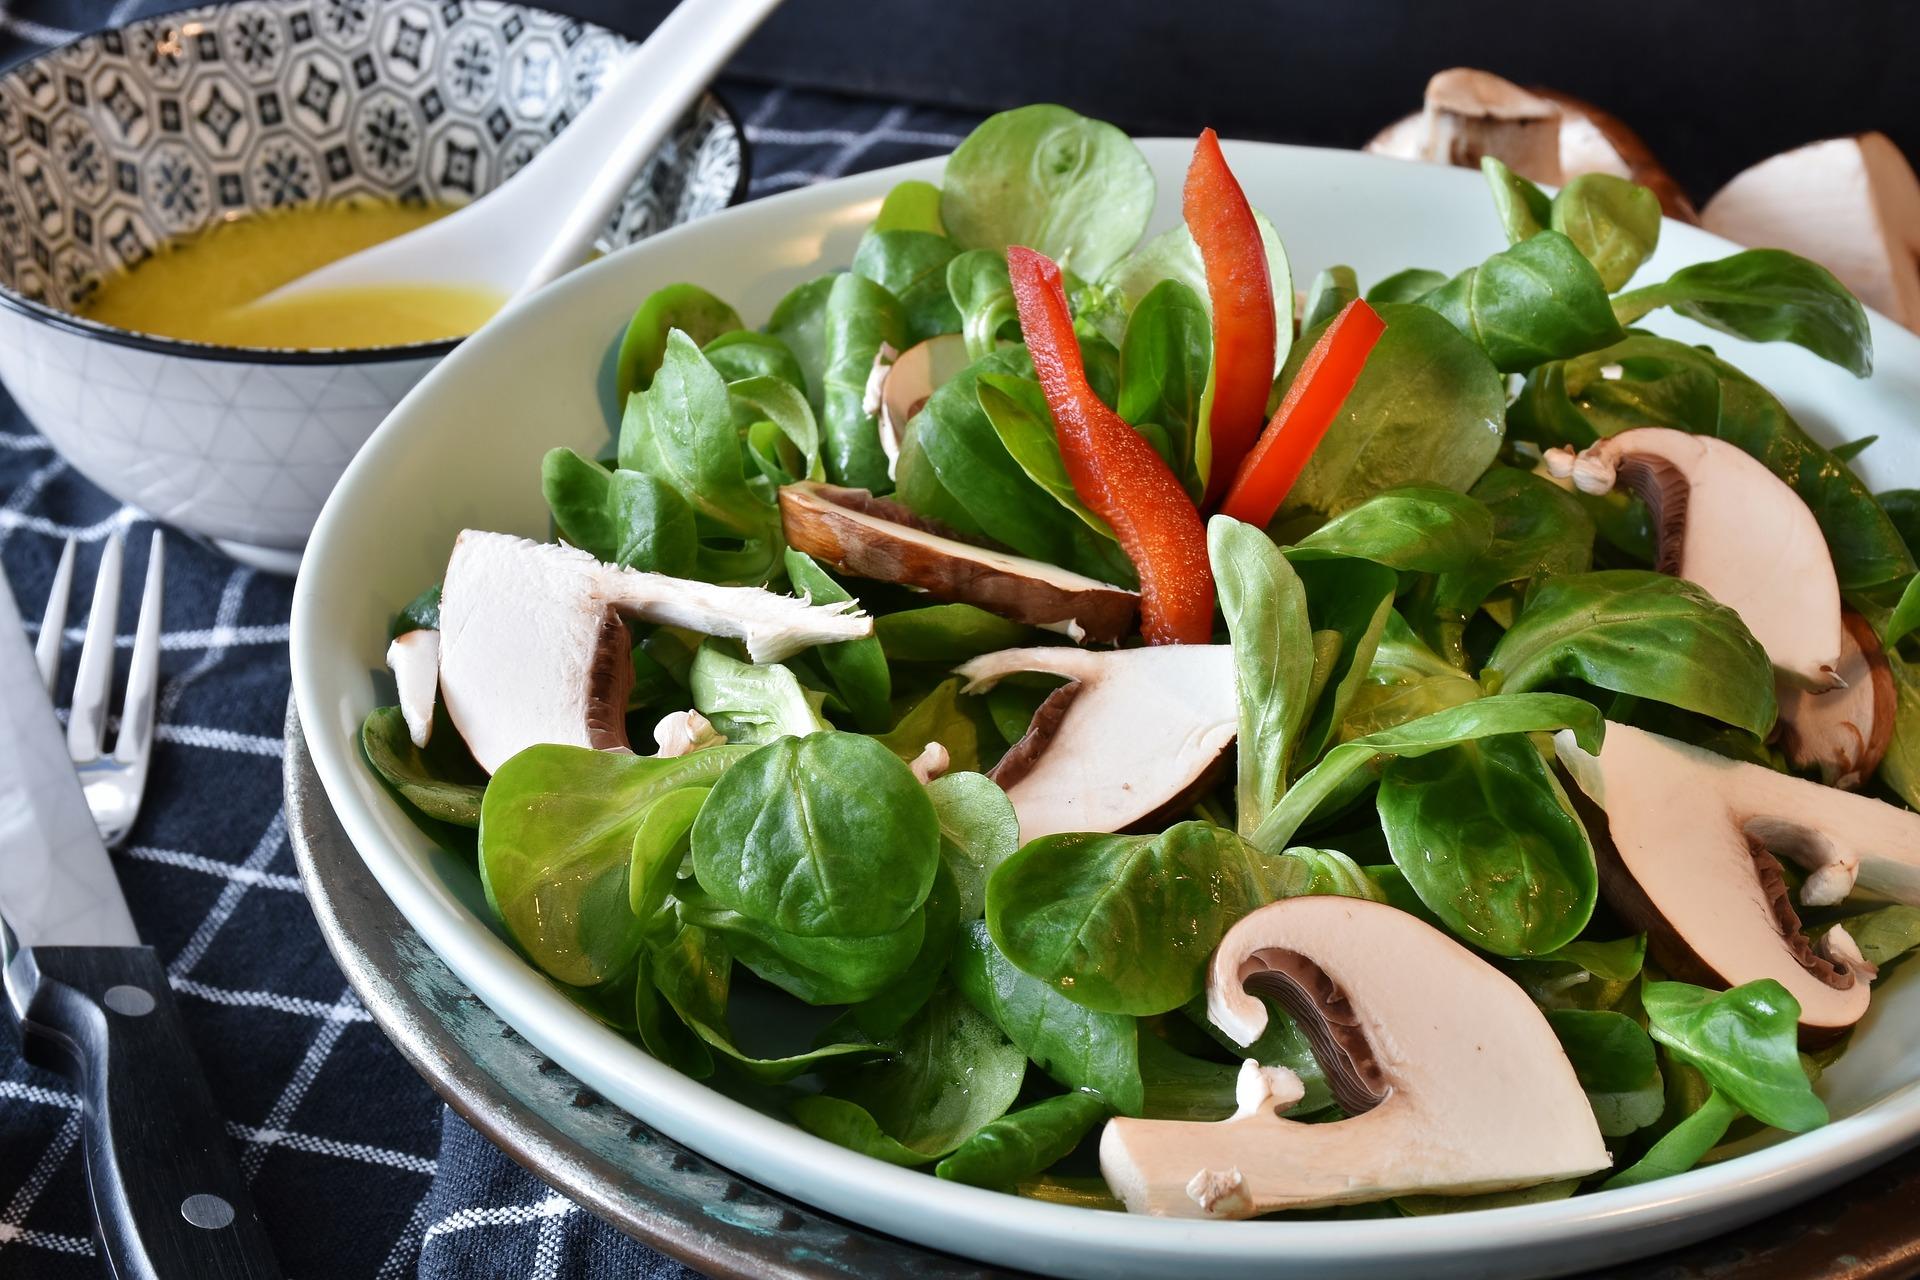 How to Grow Rocket Lettuce (Arugula)